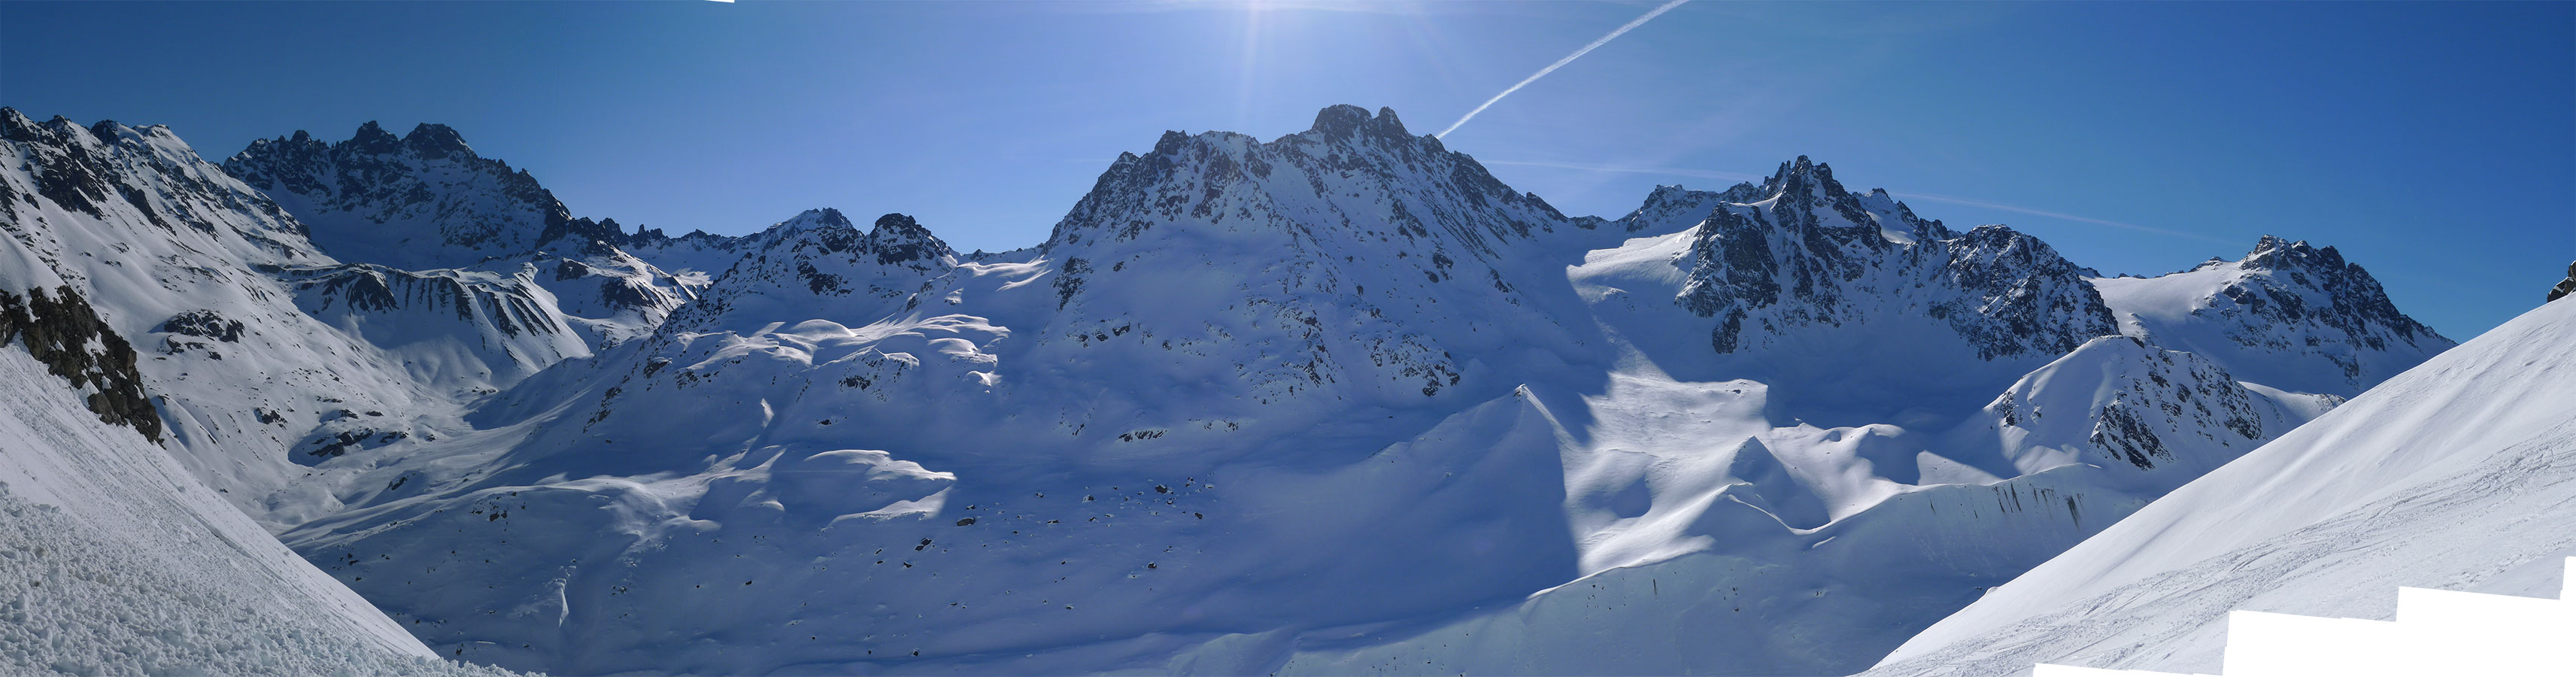 Haagspitze East (Jamtalhütte) Silvretta Rakousko panorama 09